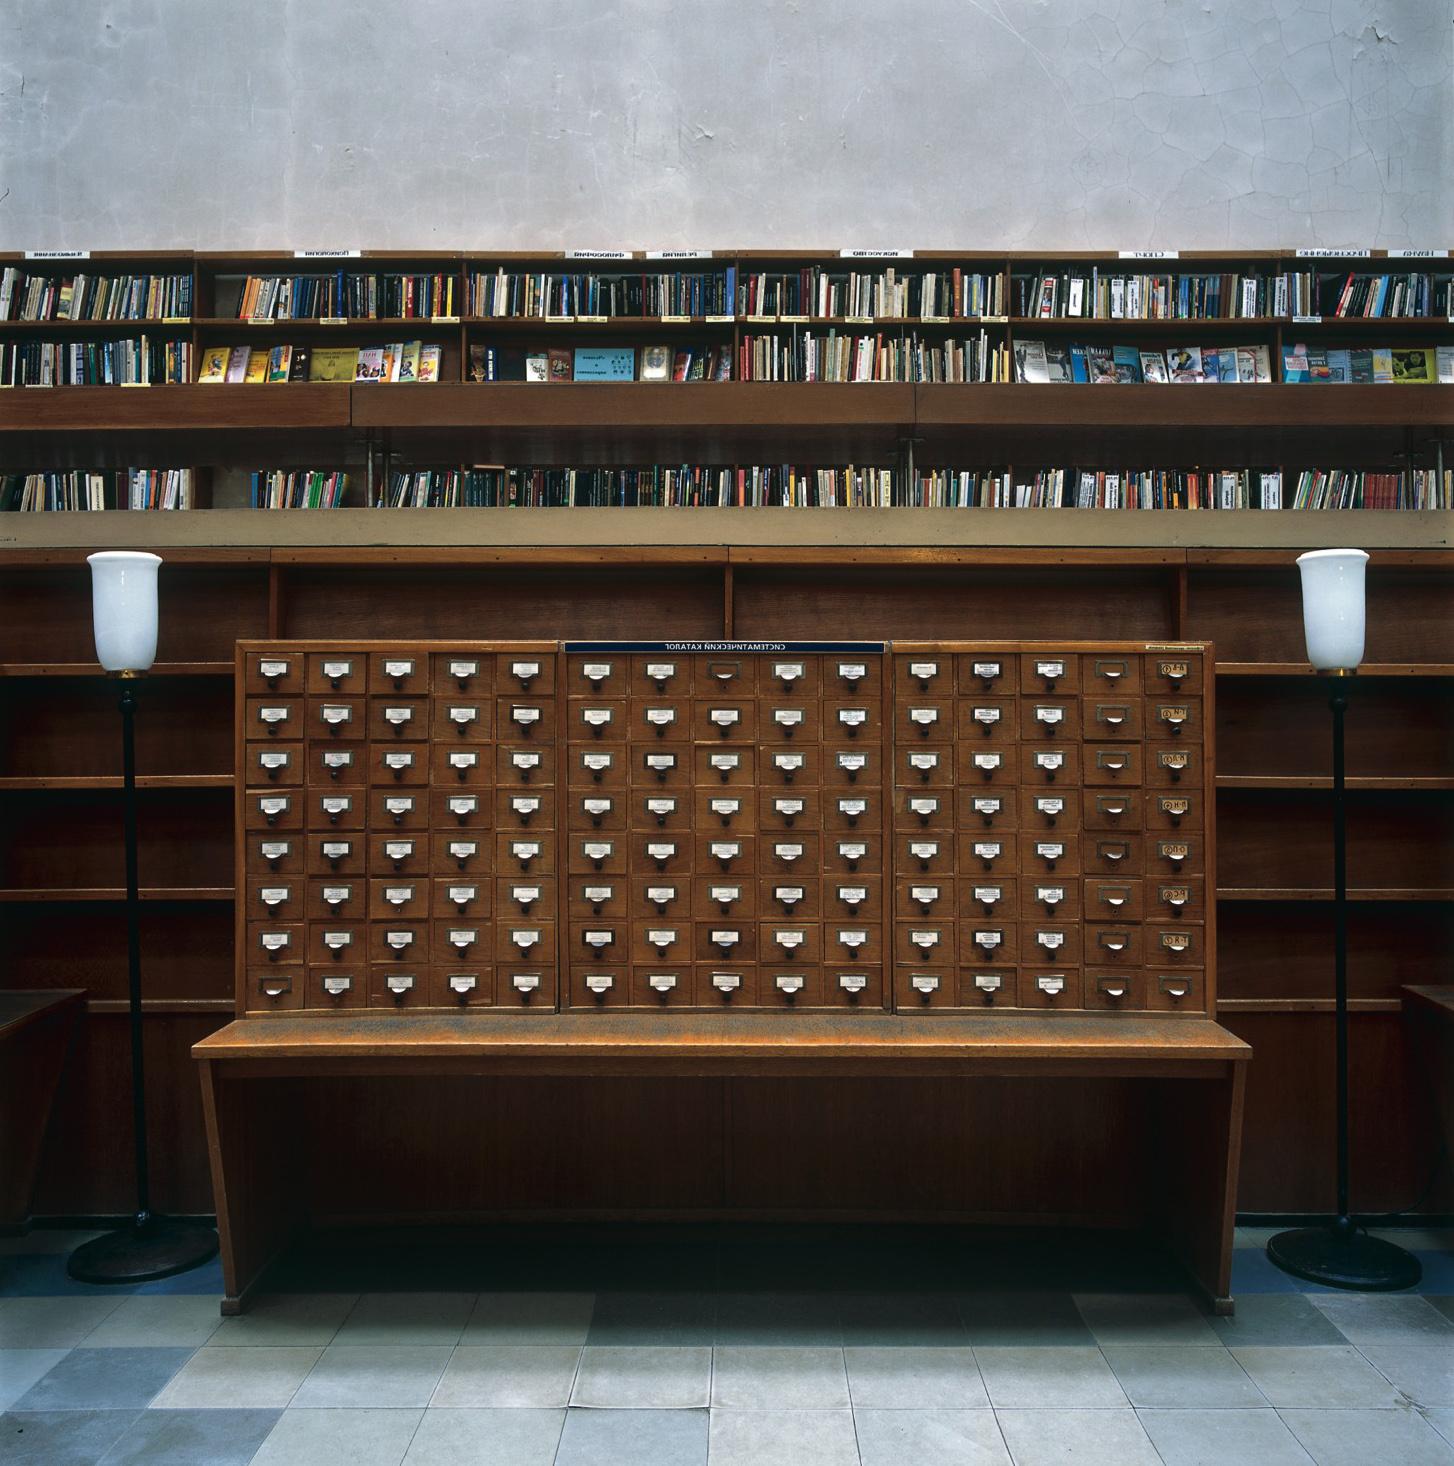 История дизайна: Айно и Алвар Аалто (галерея 13, фото 0)